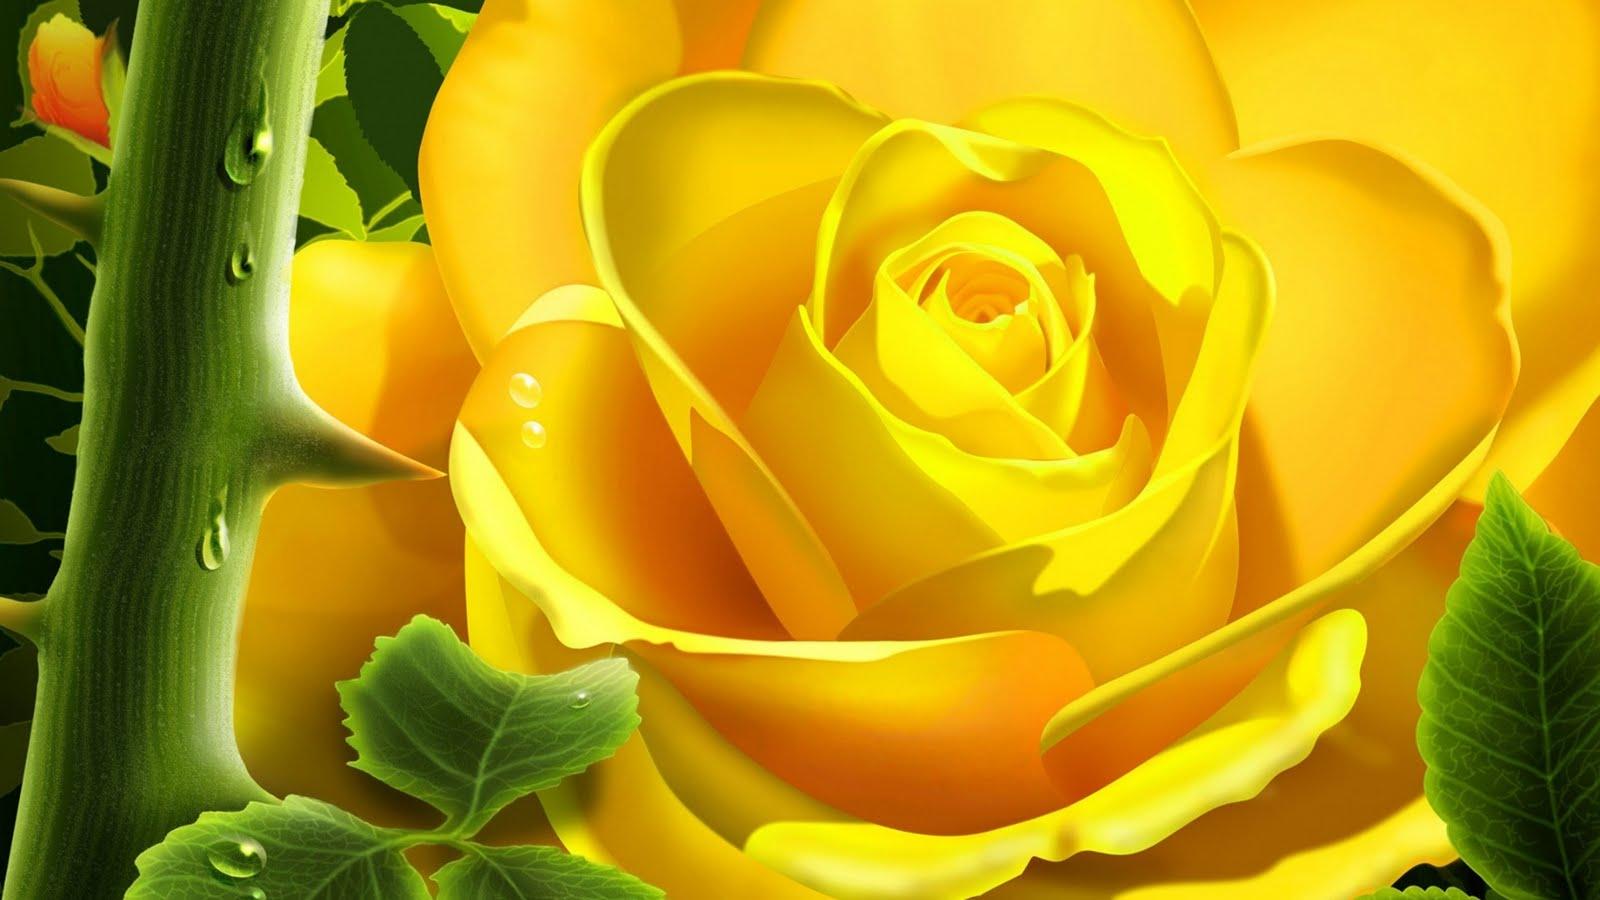 Yellow Rose Free Wallpaper For Download Desktop × Hdtv